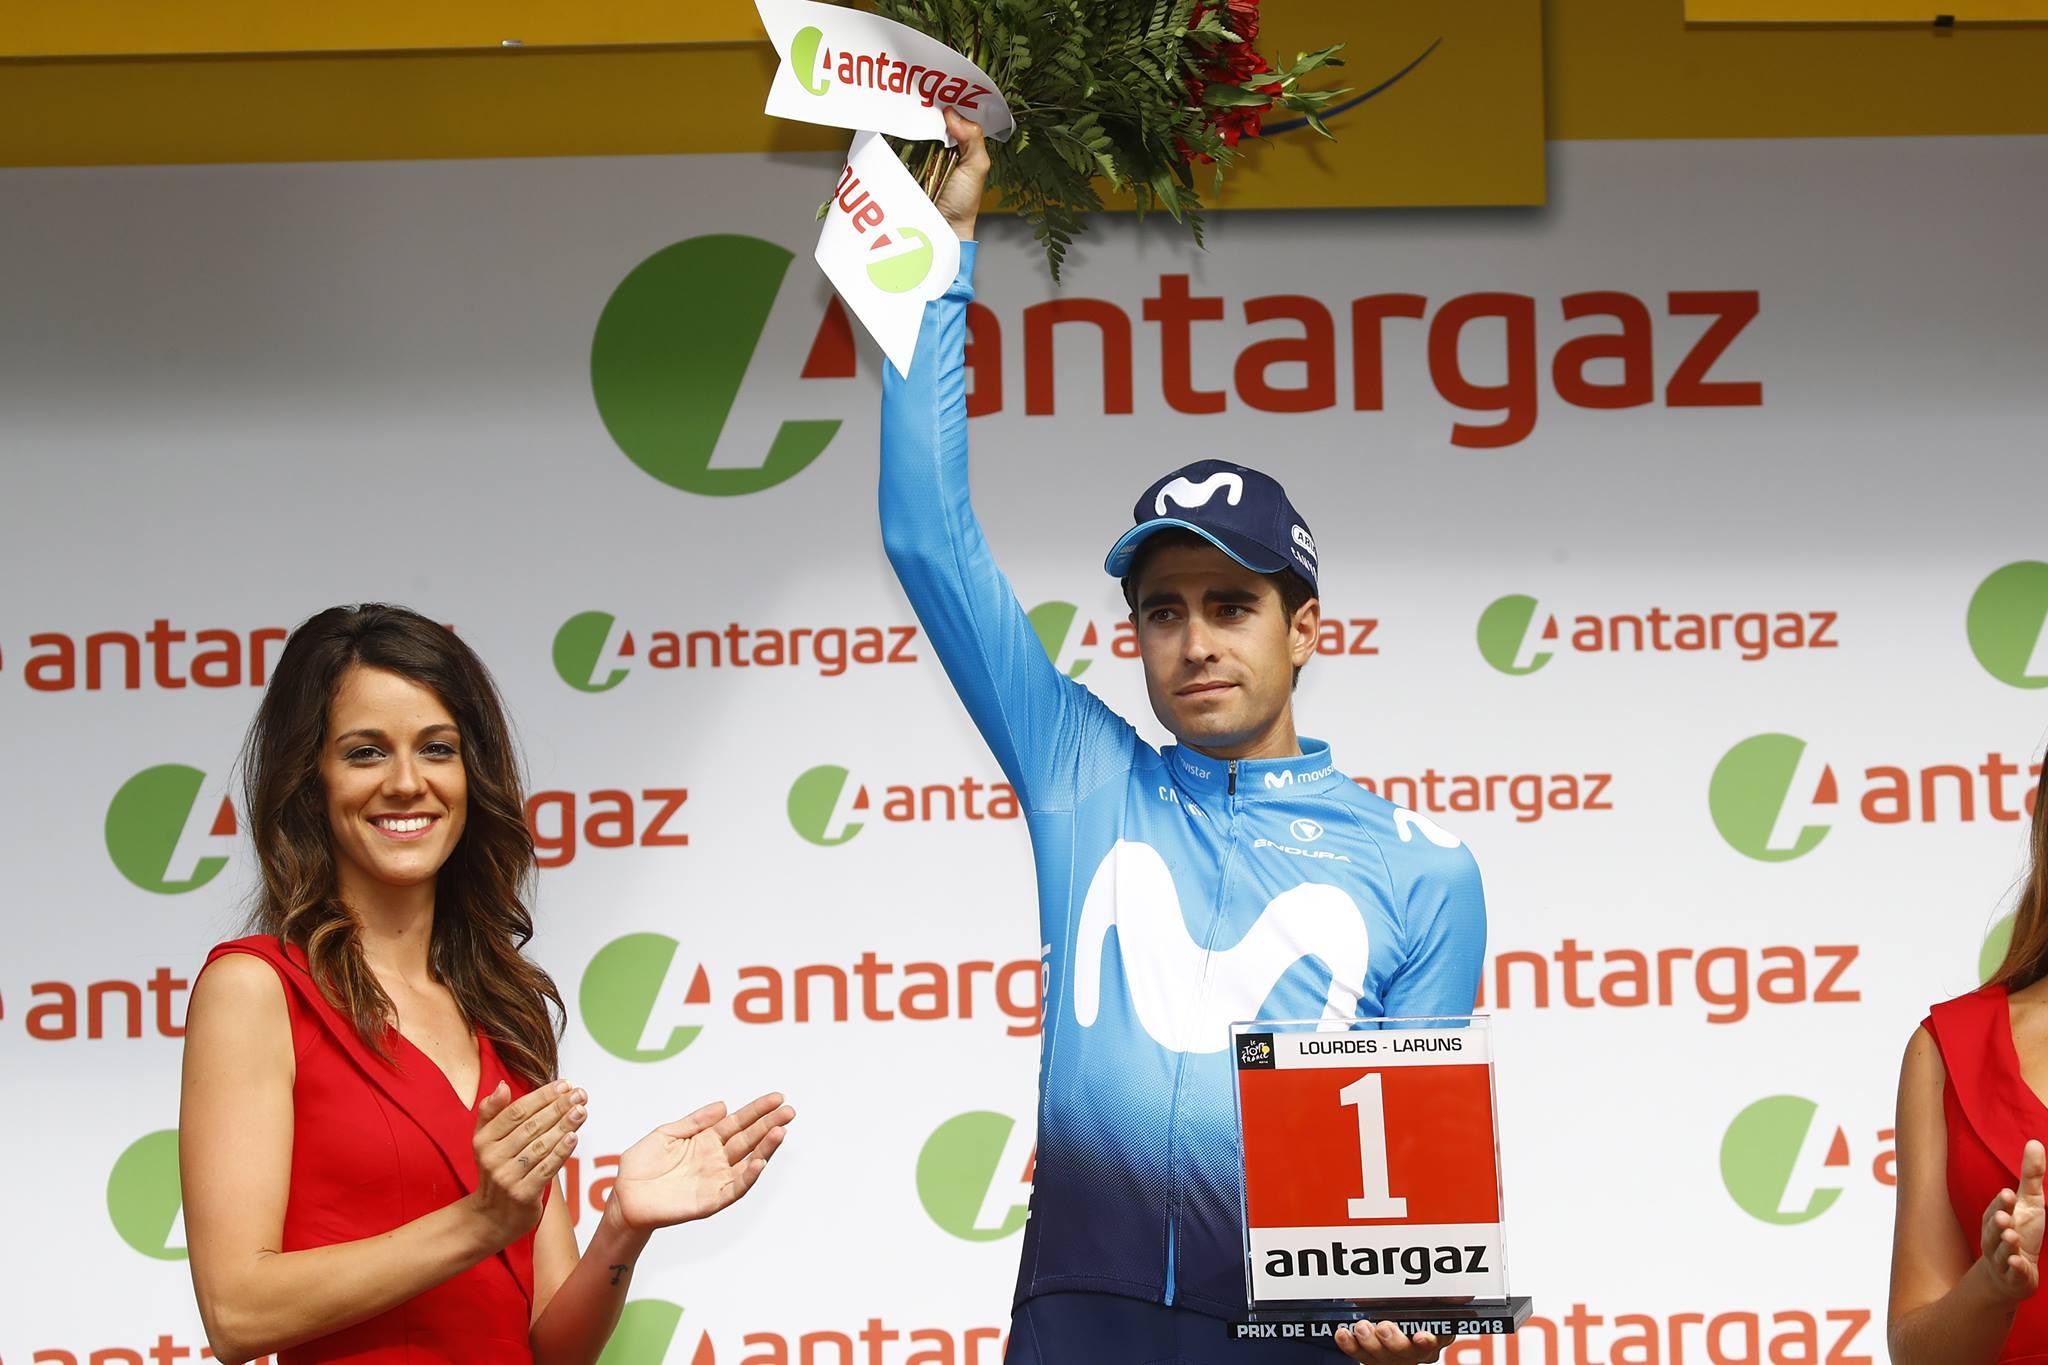 Tour - Mikel Landa JoanSeguidor